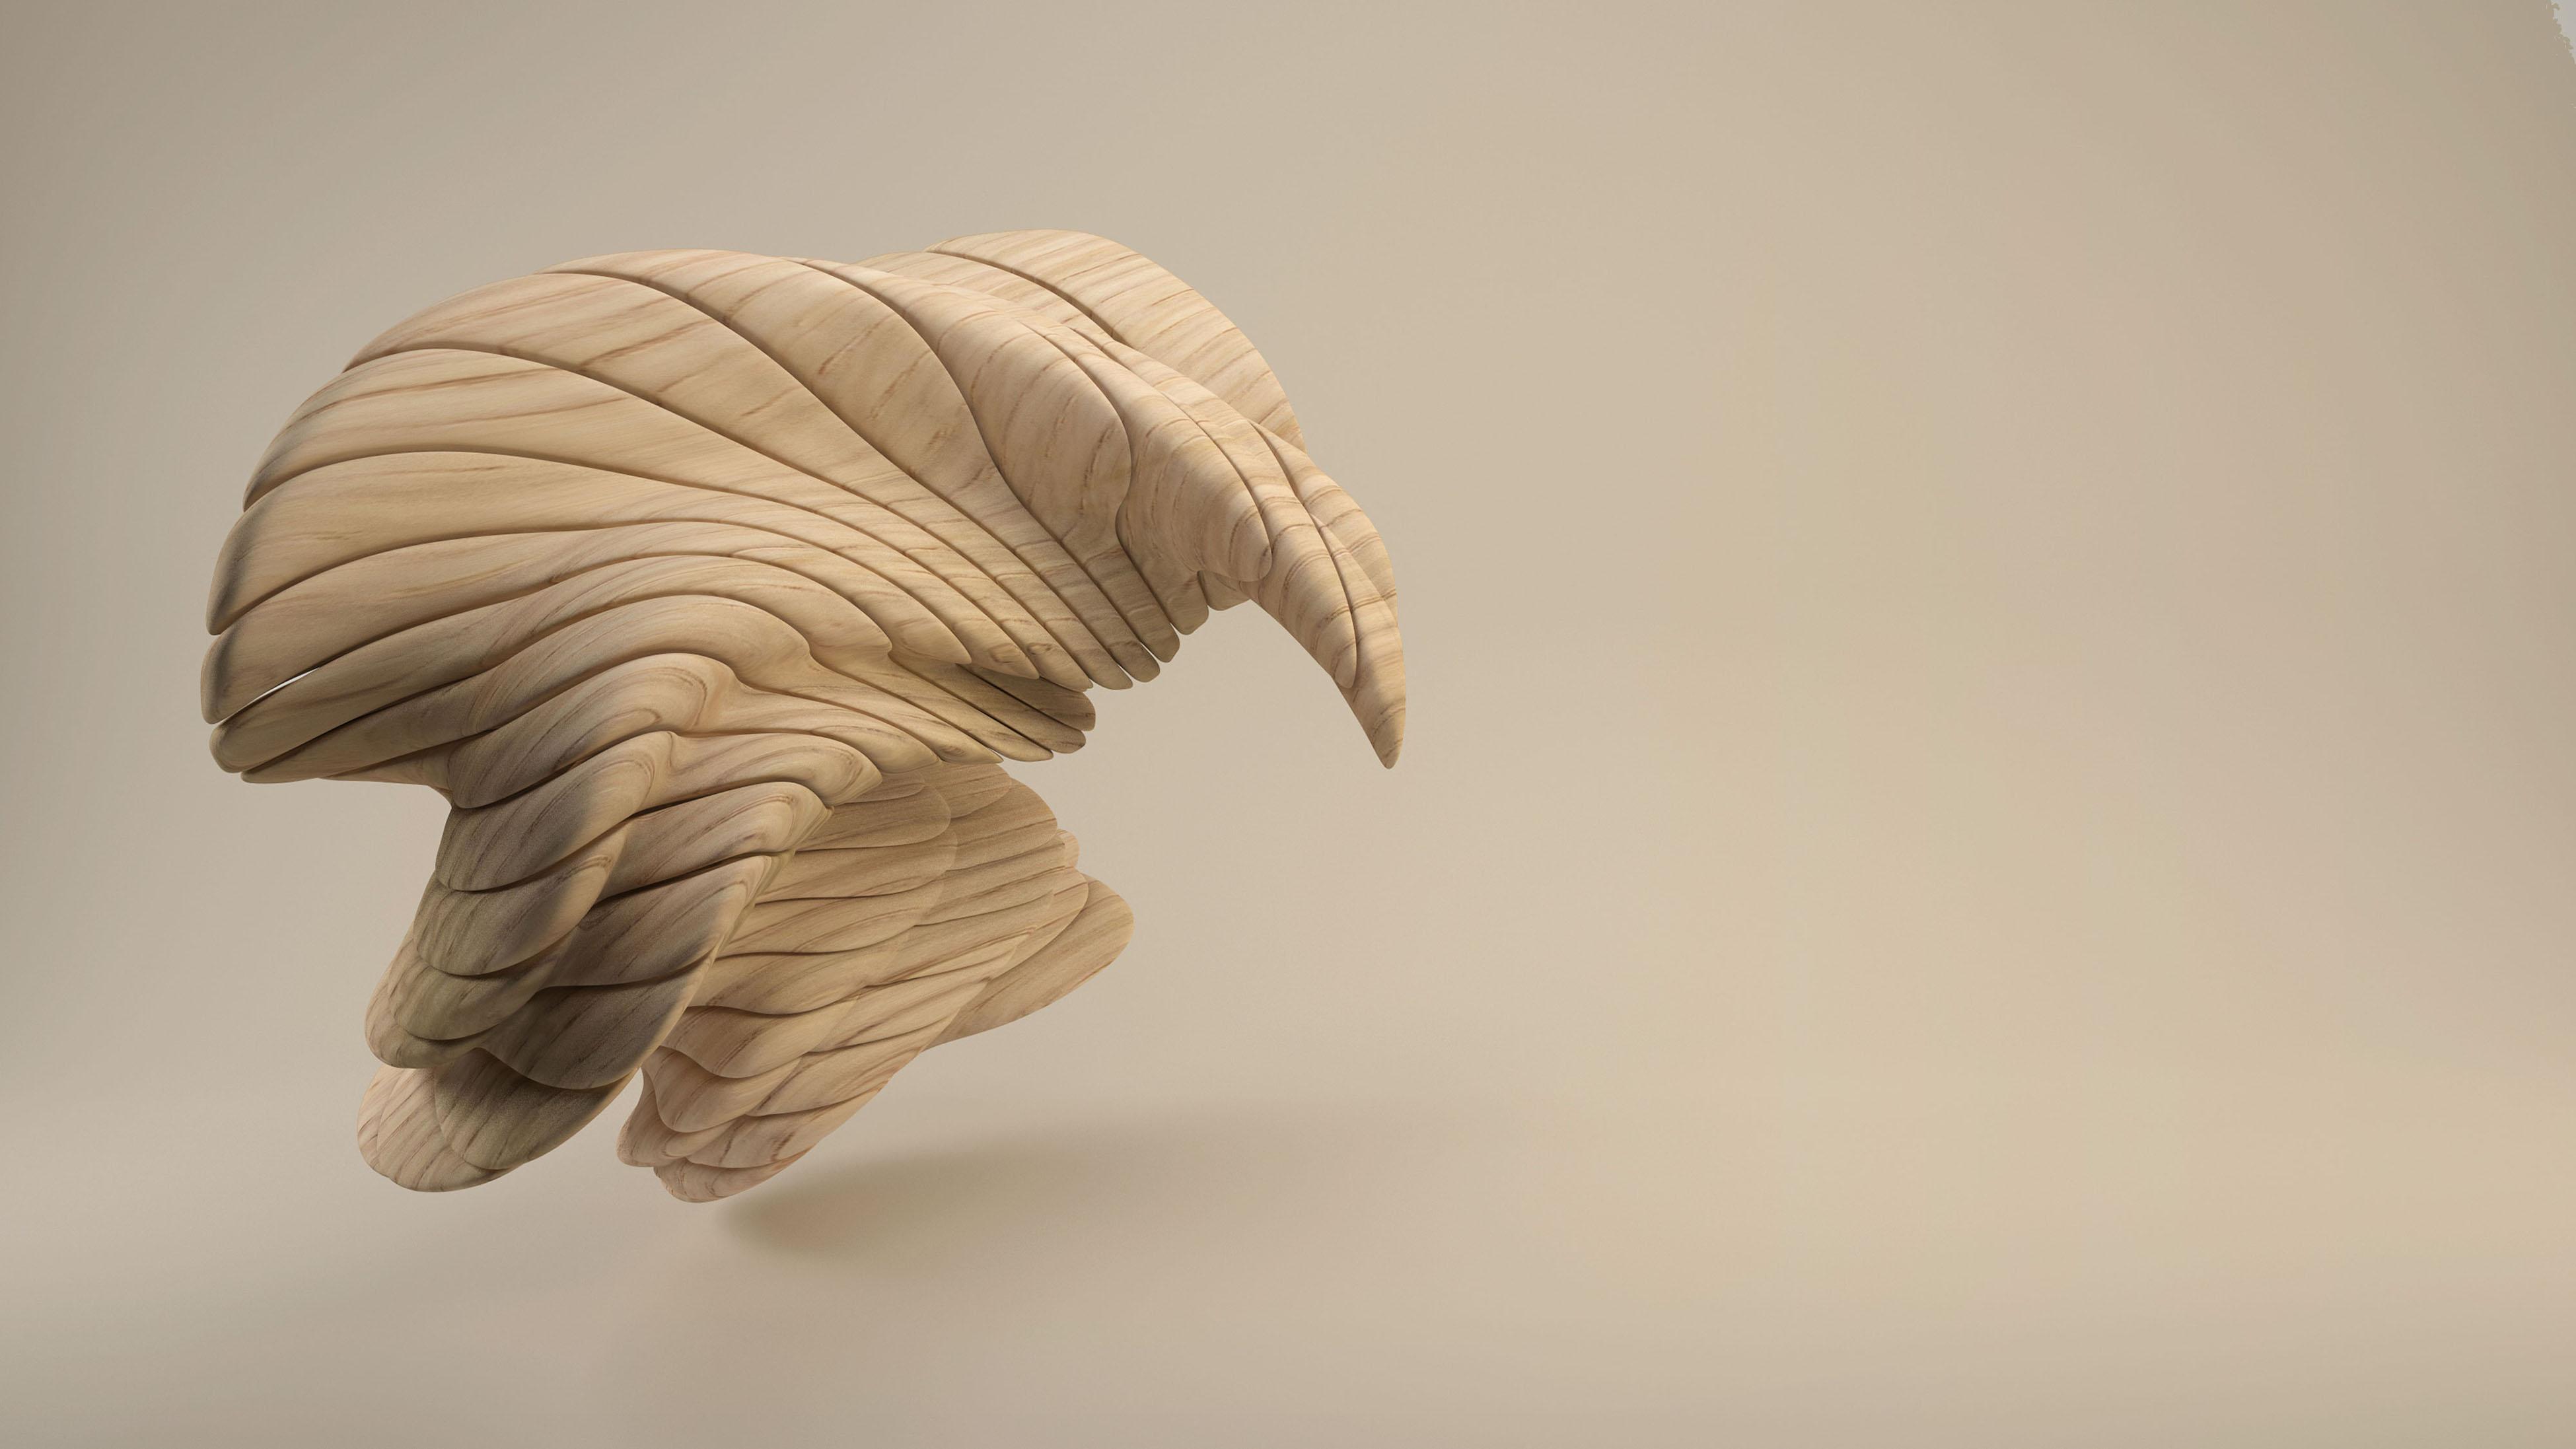 3D Wooden Figure